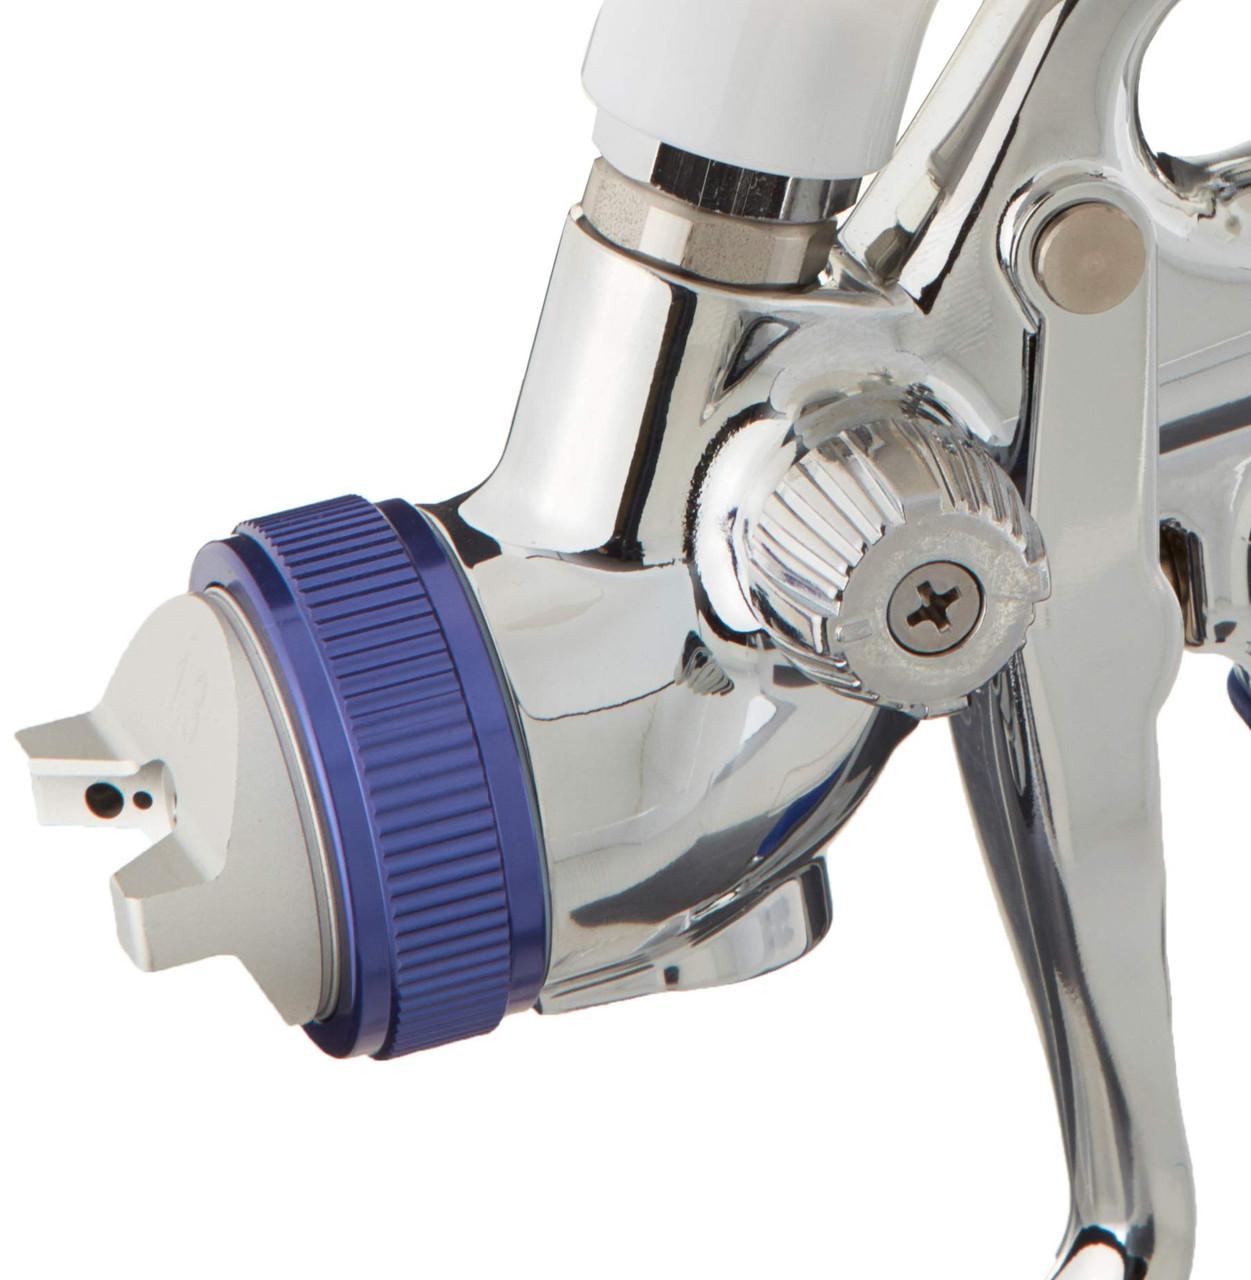 Fuji Spray 2895-T75G Q5 Platinum Quiet HVLP Spray System + Accessories